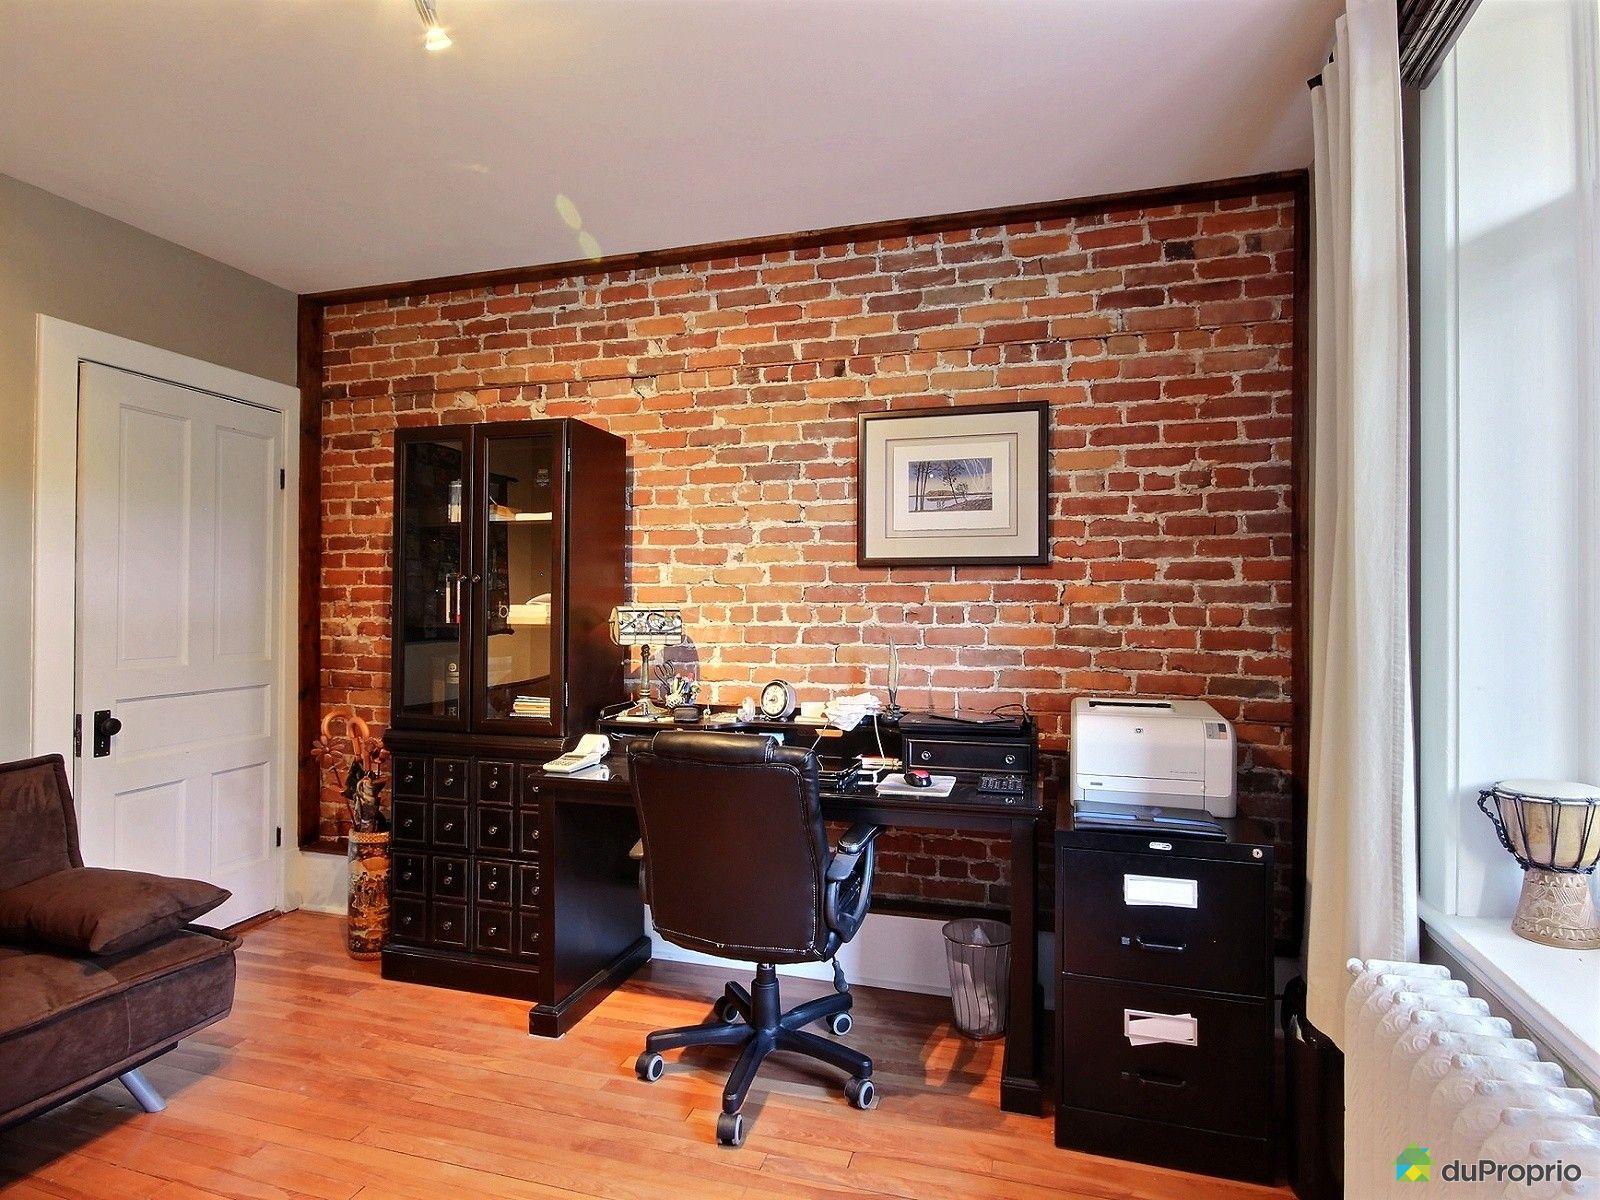 condo vendu montcalm immobilier qu bec duproprio 629854. Black Bedroom Furniture Sets. Home Design Ideas